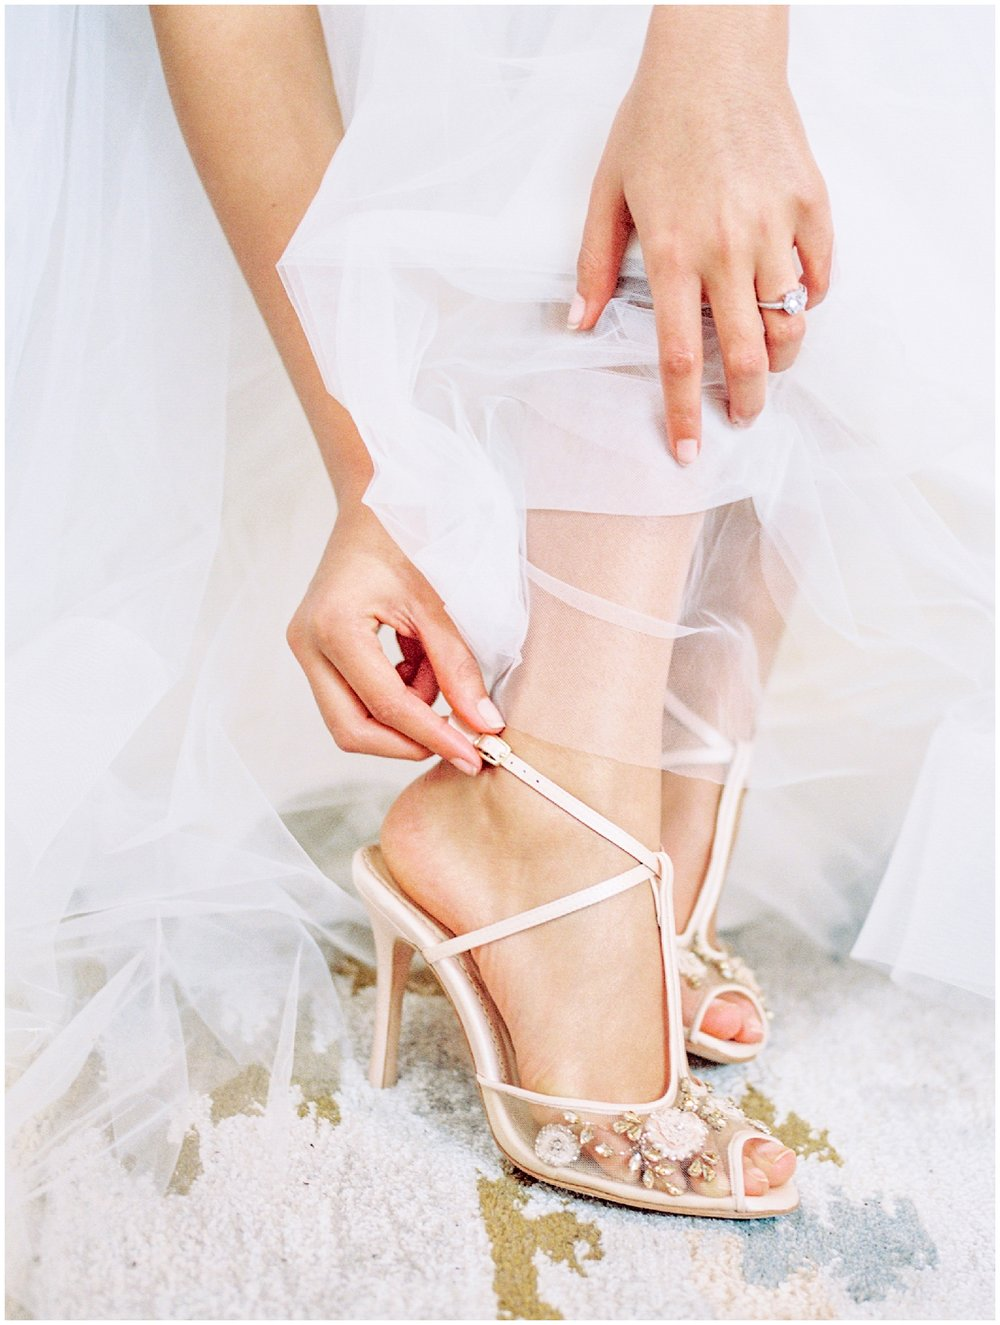 Lisa Silva Photography- Ponte Vedra Beach and Jacksonville, Florida Fine Art Film Wedding Photography- Spring Bridal Shoot at Ellie's Garden in San Marco, Jacksonville_0014.jpg